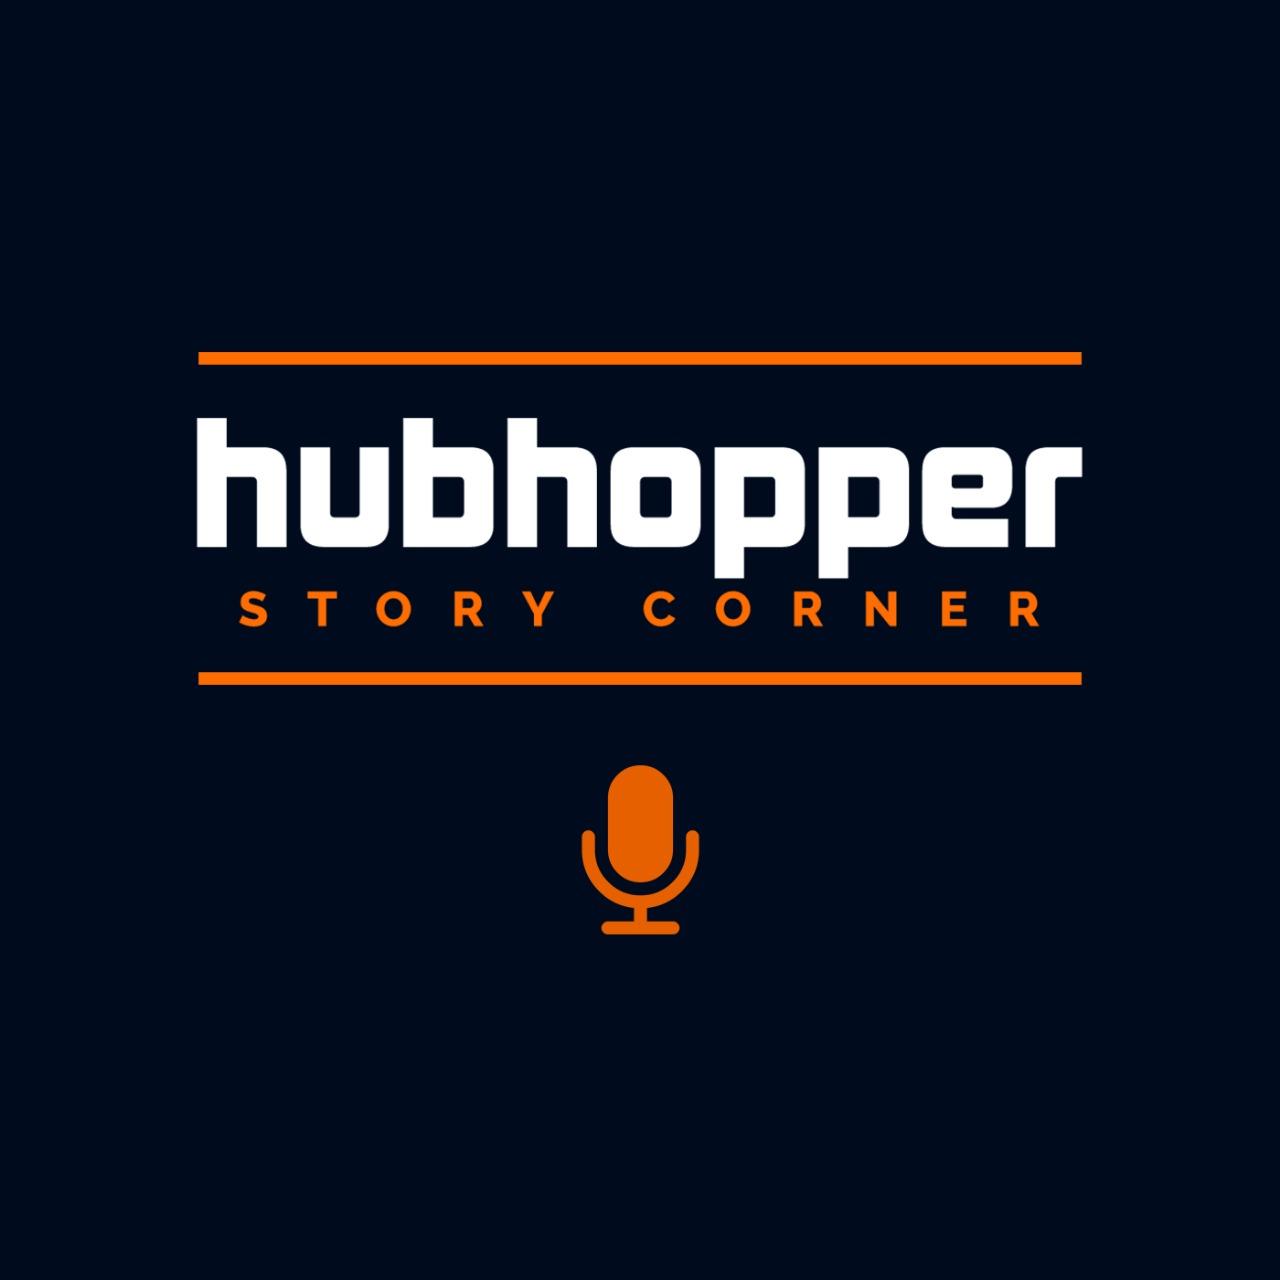 Hubhopper story corner